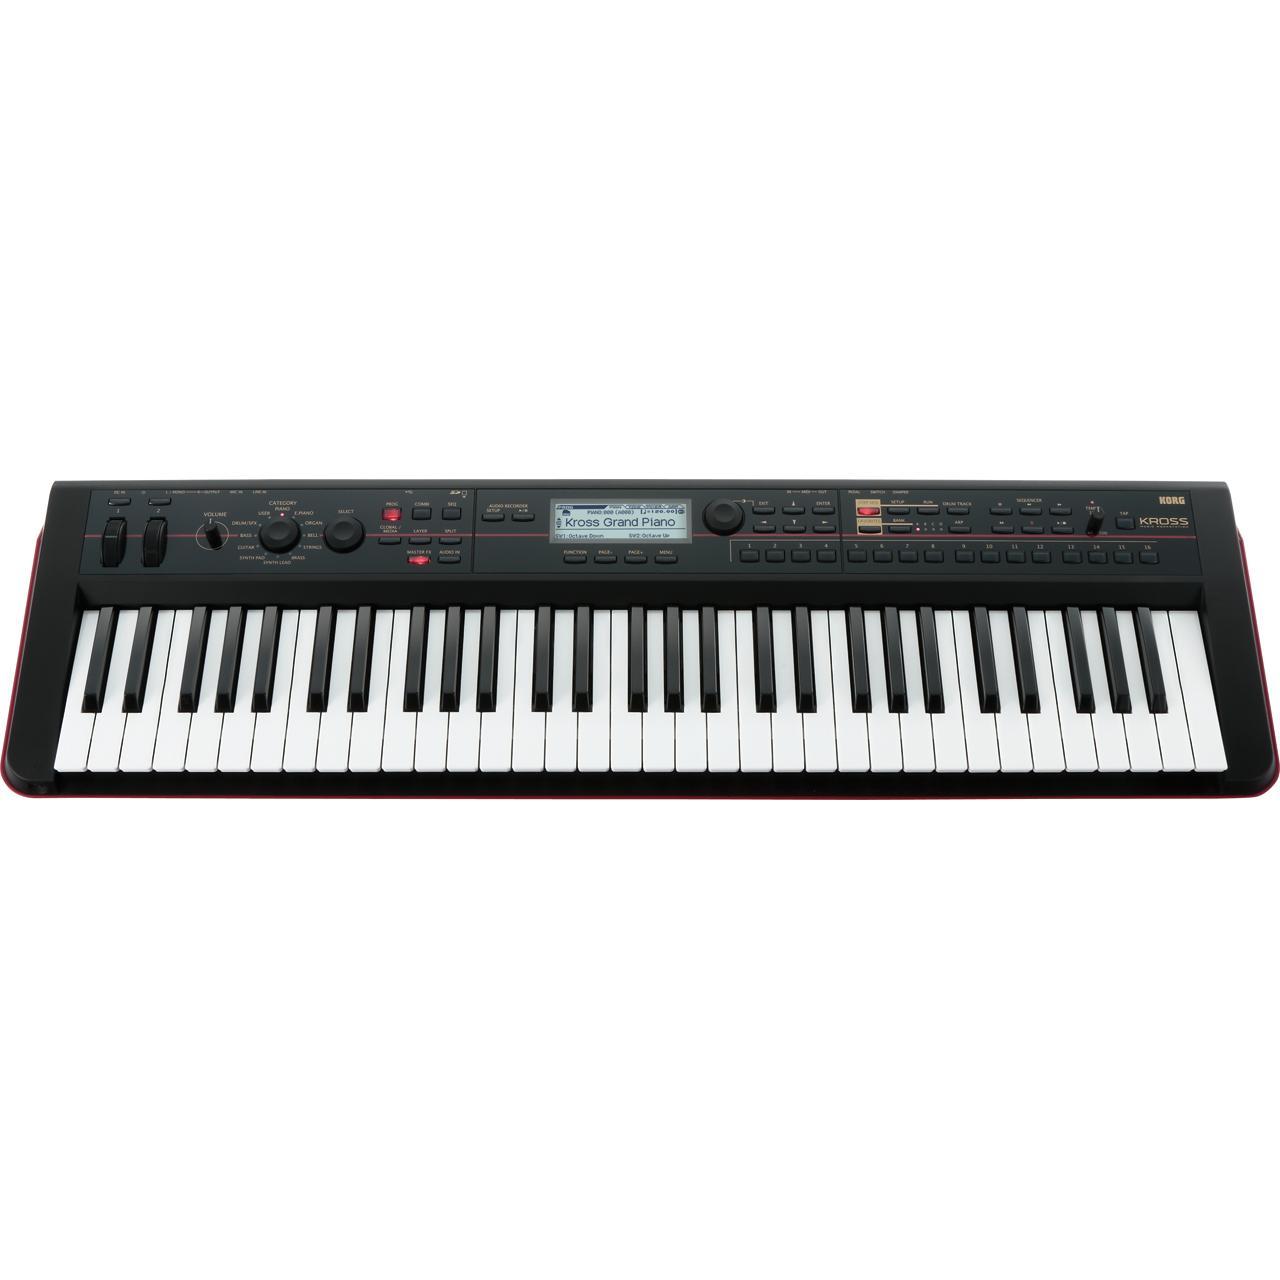 korg kross 88 key absolute pianoabsolute piano. Black Bedroom Furniture Sets. Home Design Ideas